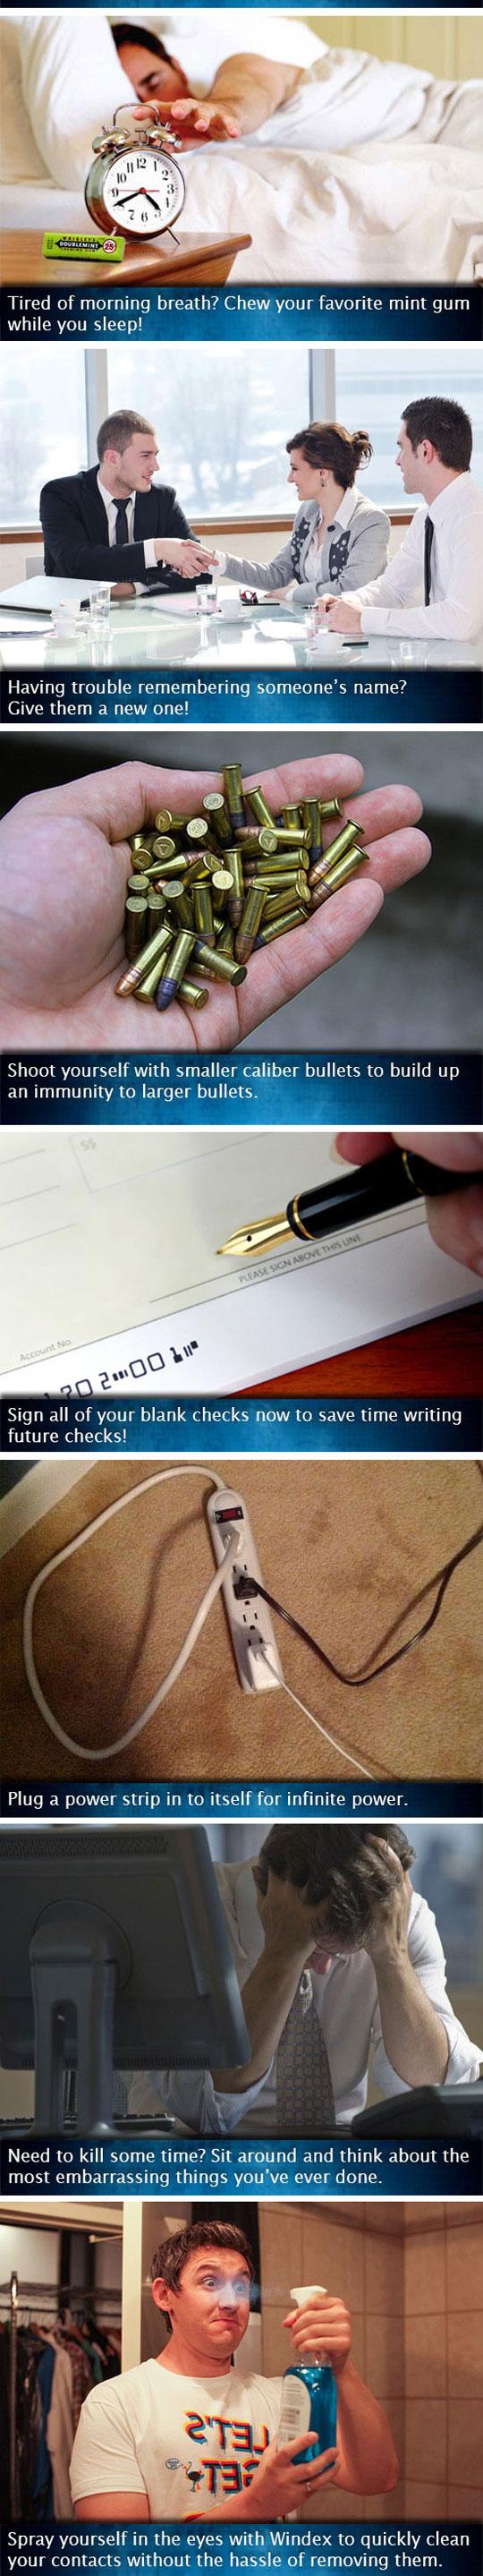 funny-helpful-tips-bullets-immunity